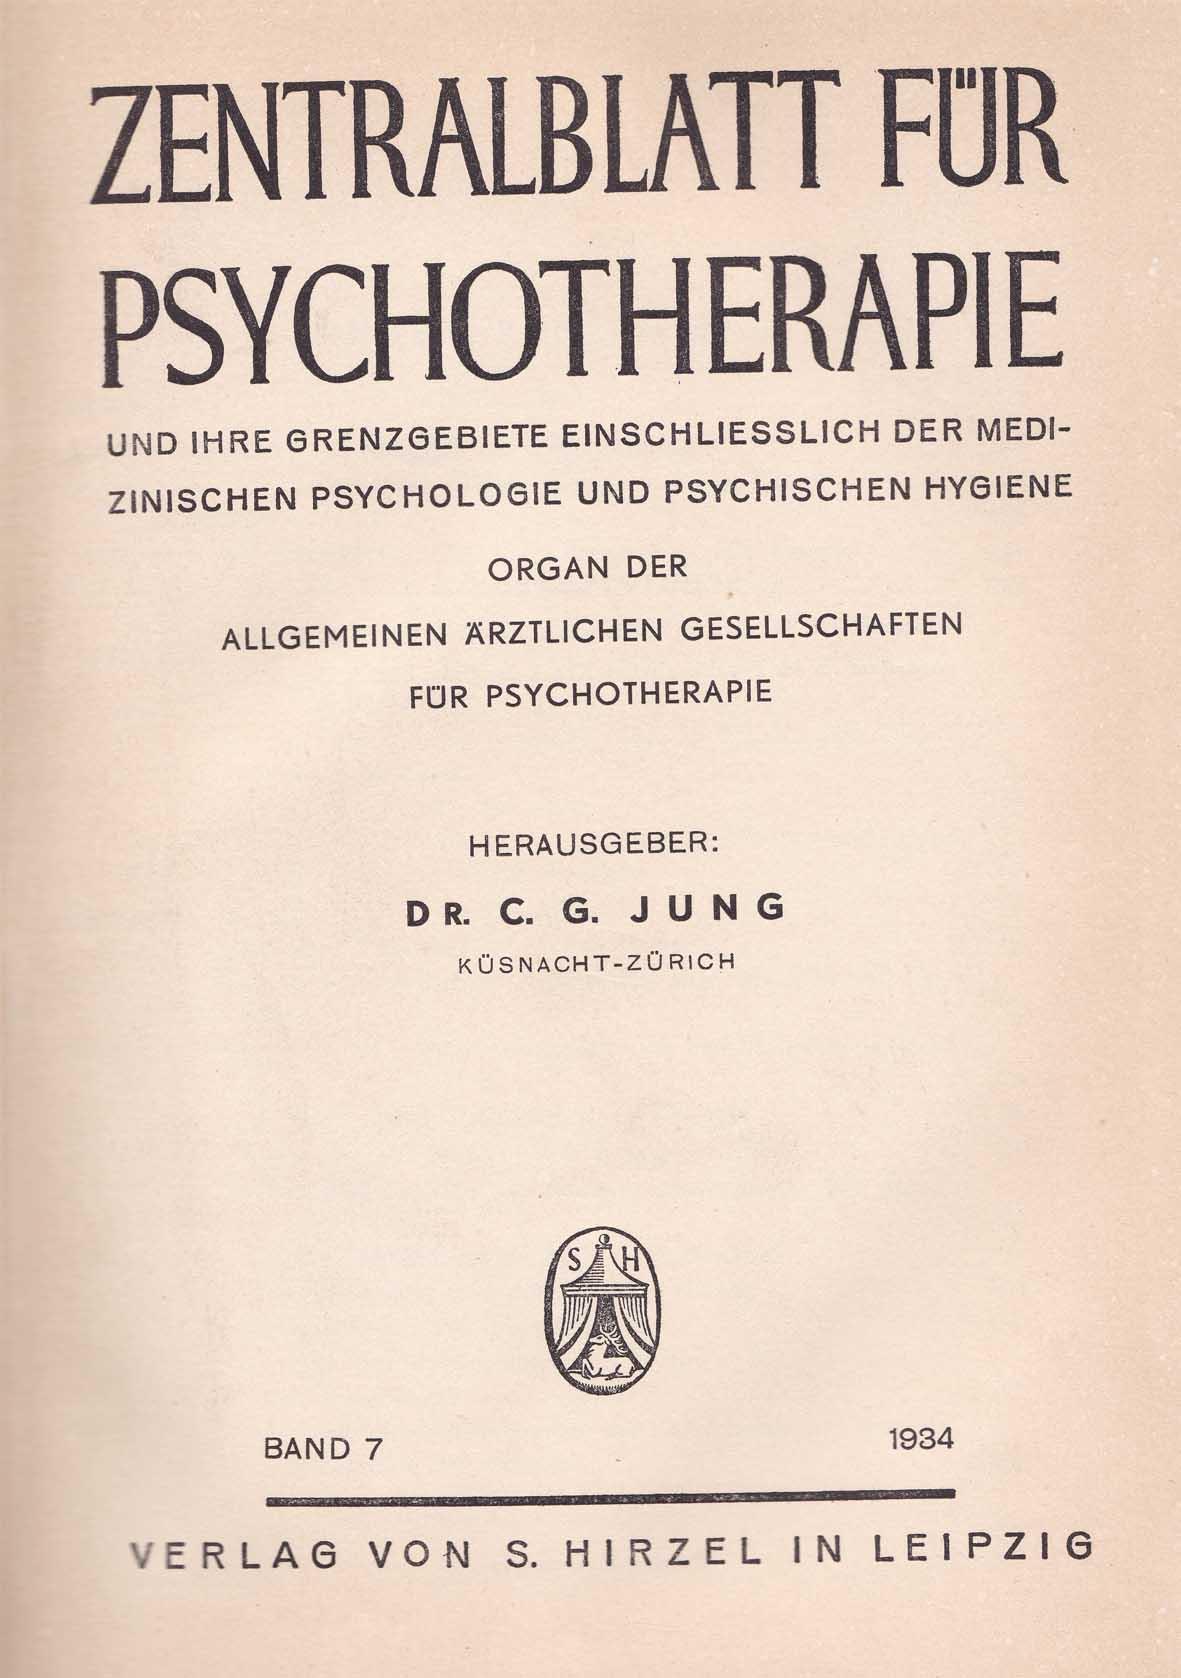 Psychoanalyse im Nationalsozialismus